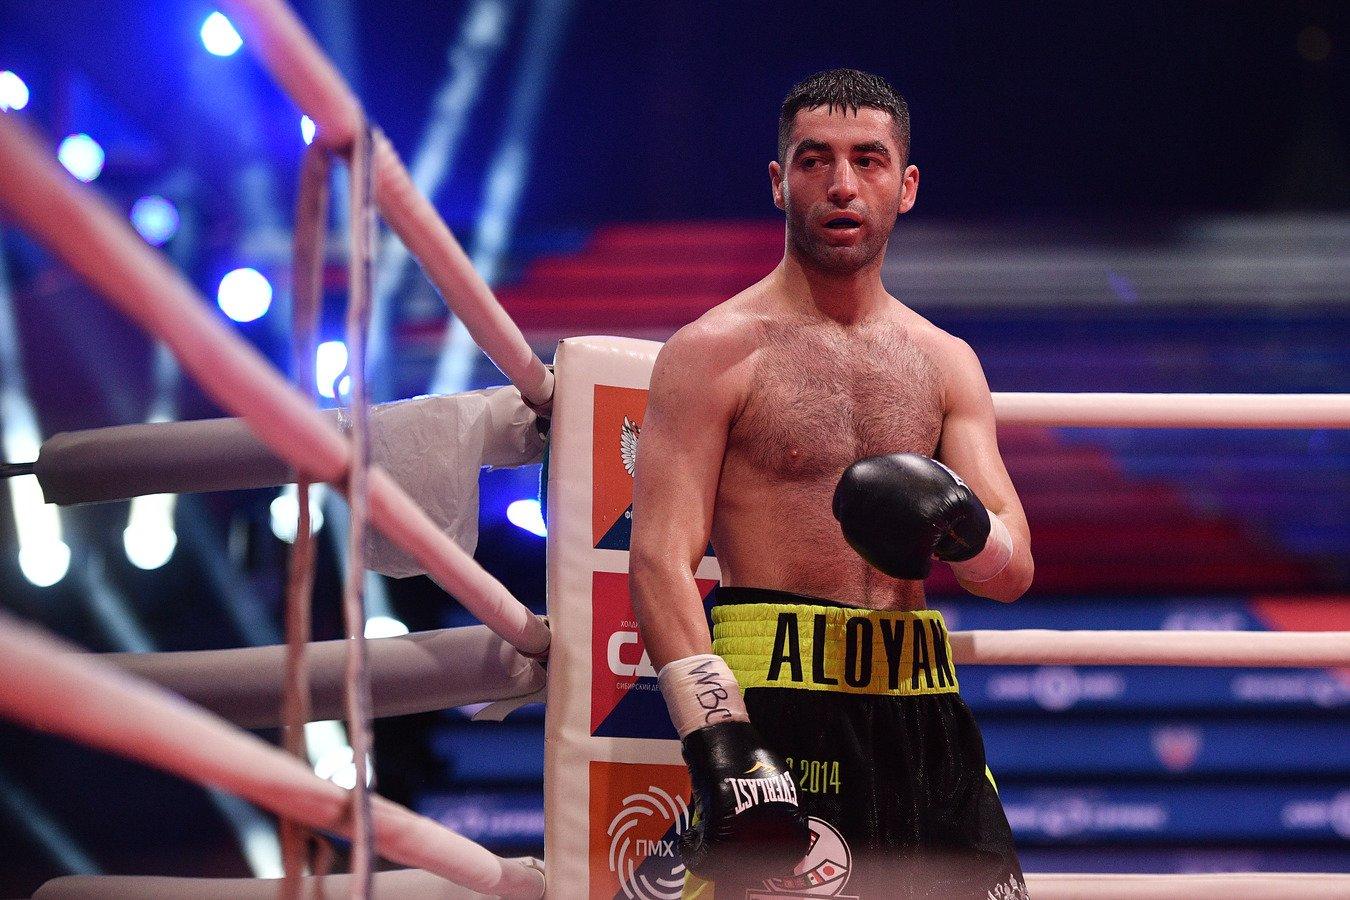 Миша Алоян защитил чемпионский титул WBA Gold, одержав досрочную победу над Грищуком